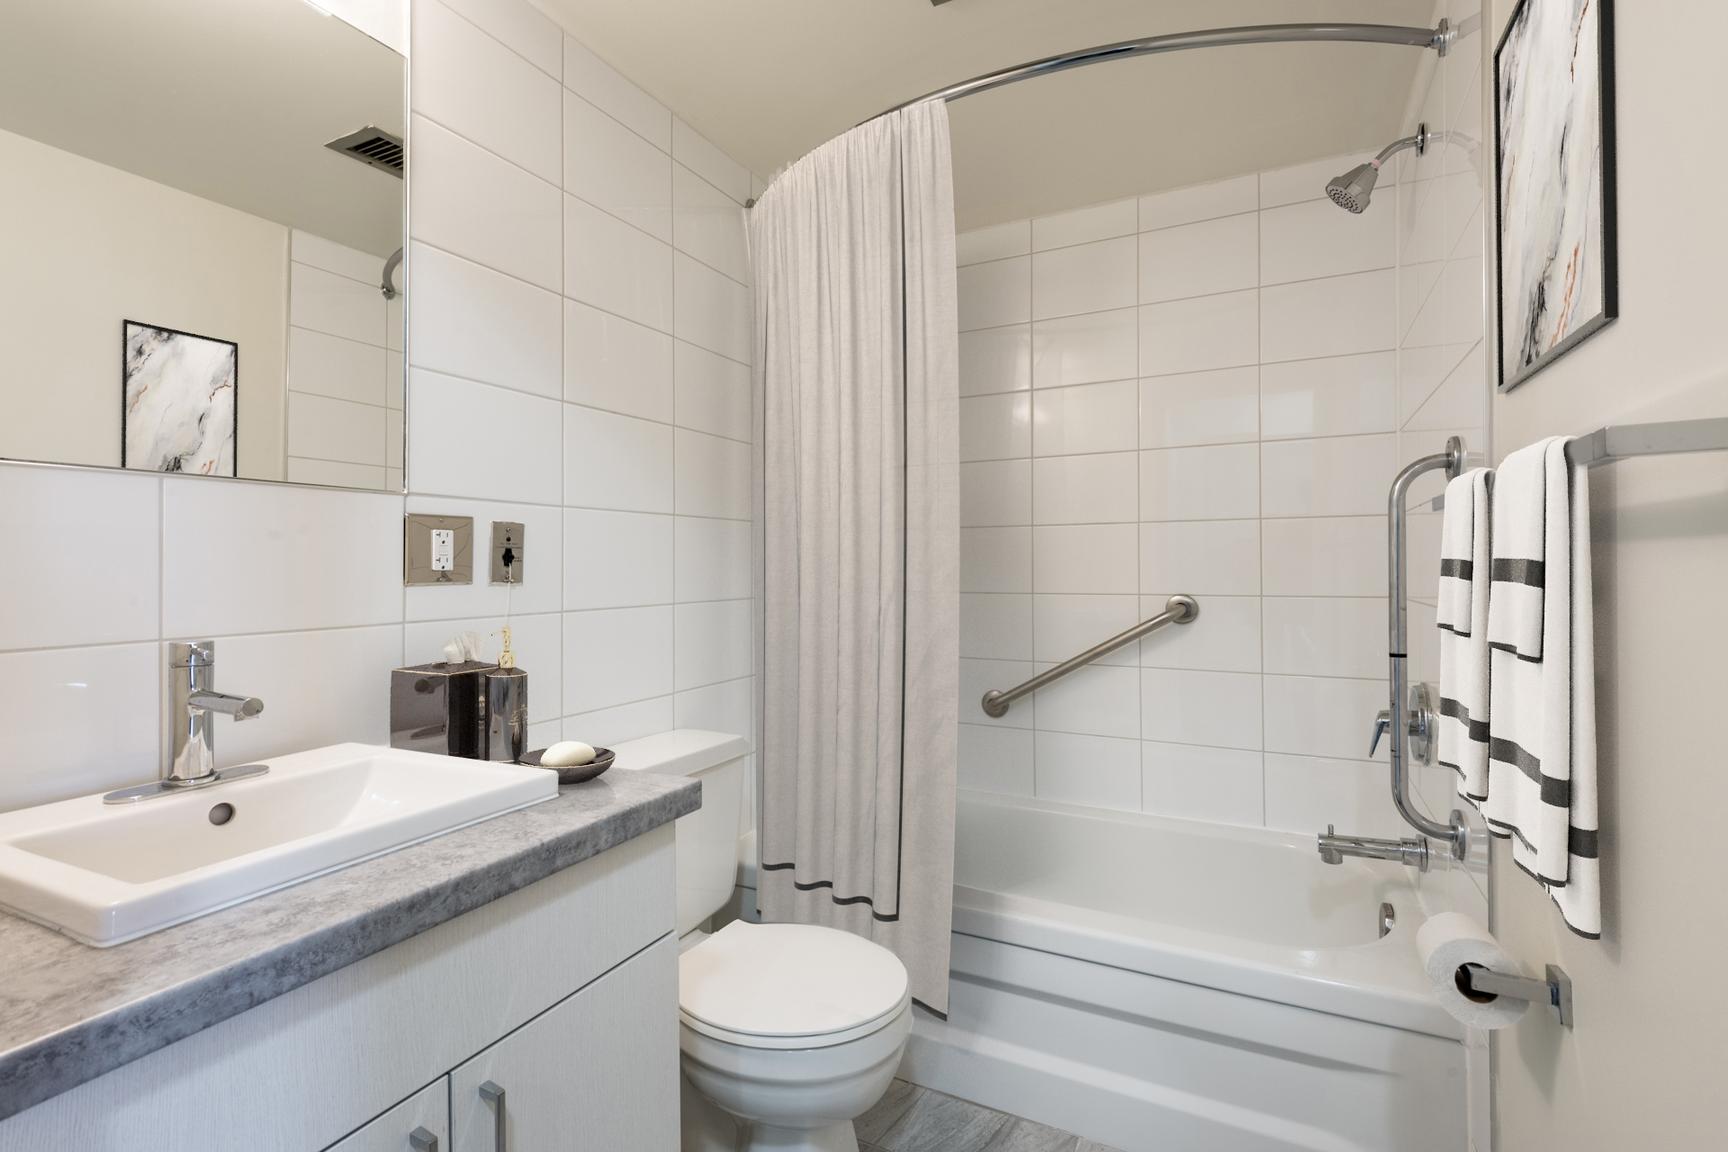 2 bedroom Apartments for rent in Laval at Le Quatre Cent - Photo 16 - RentQuebecApartments – L407185